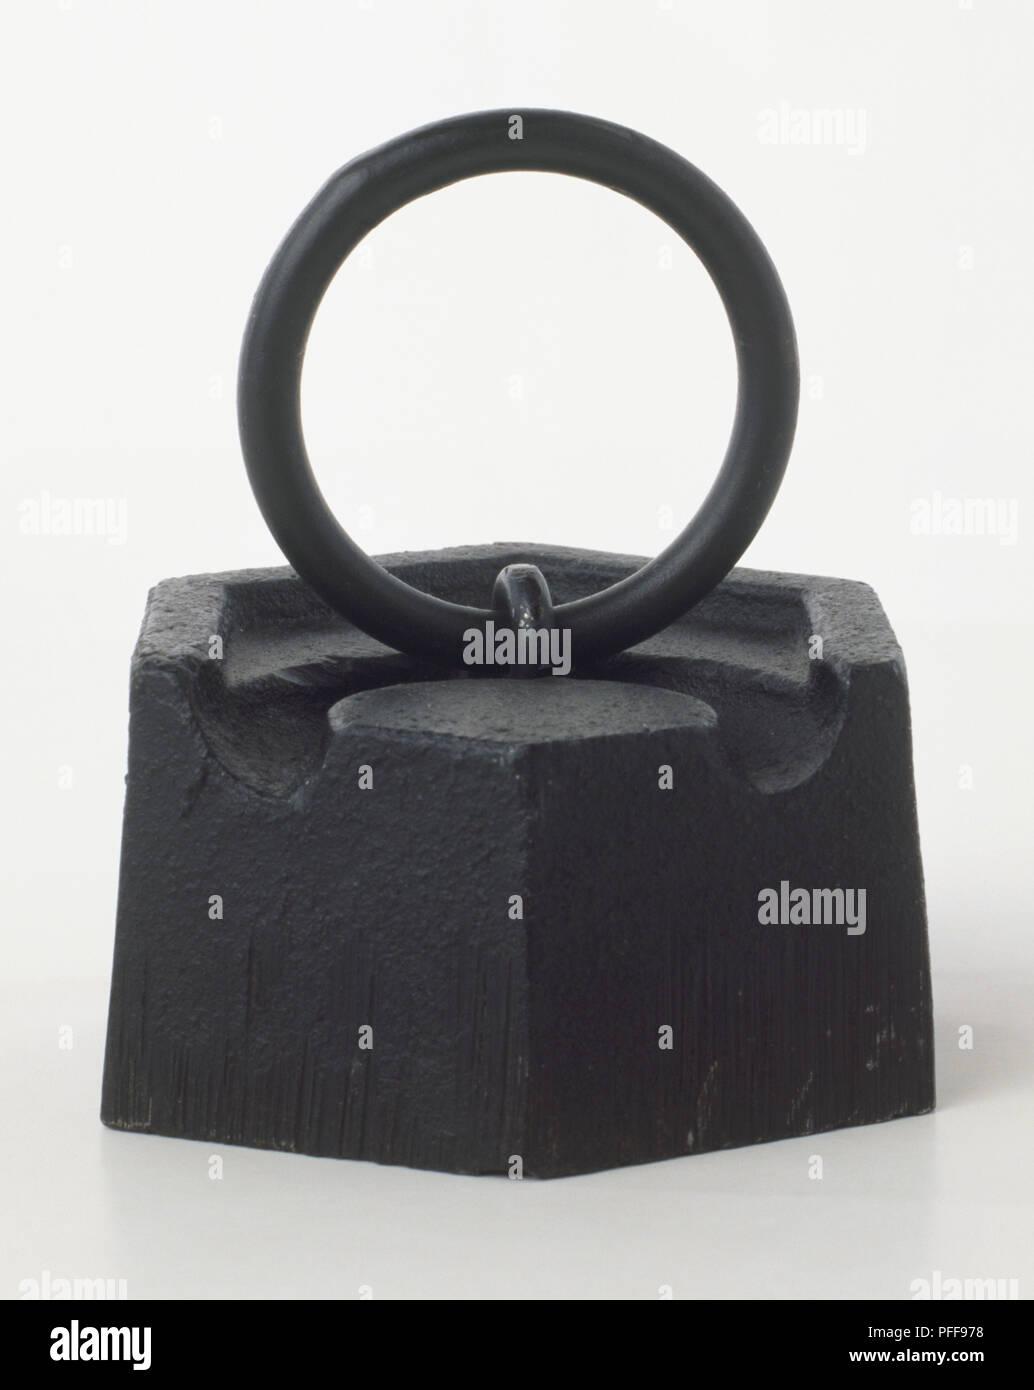 A weight, 1 kilogram mass. - Stock Image